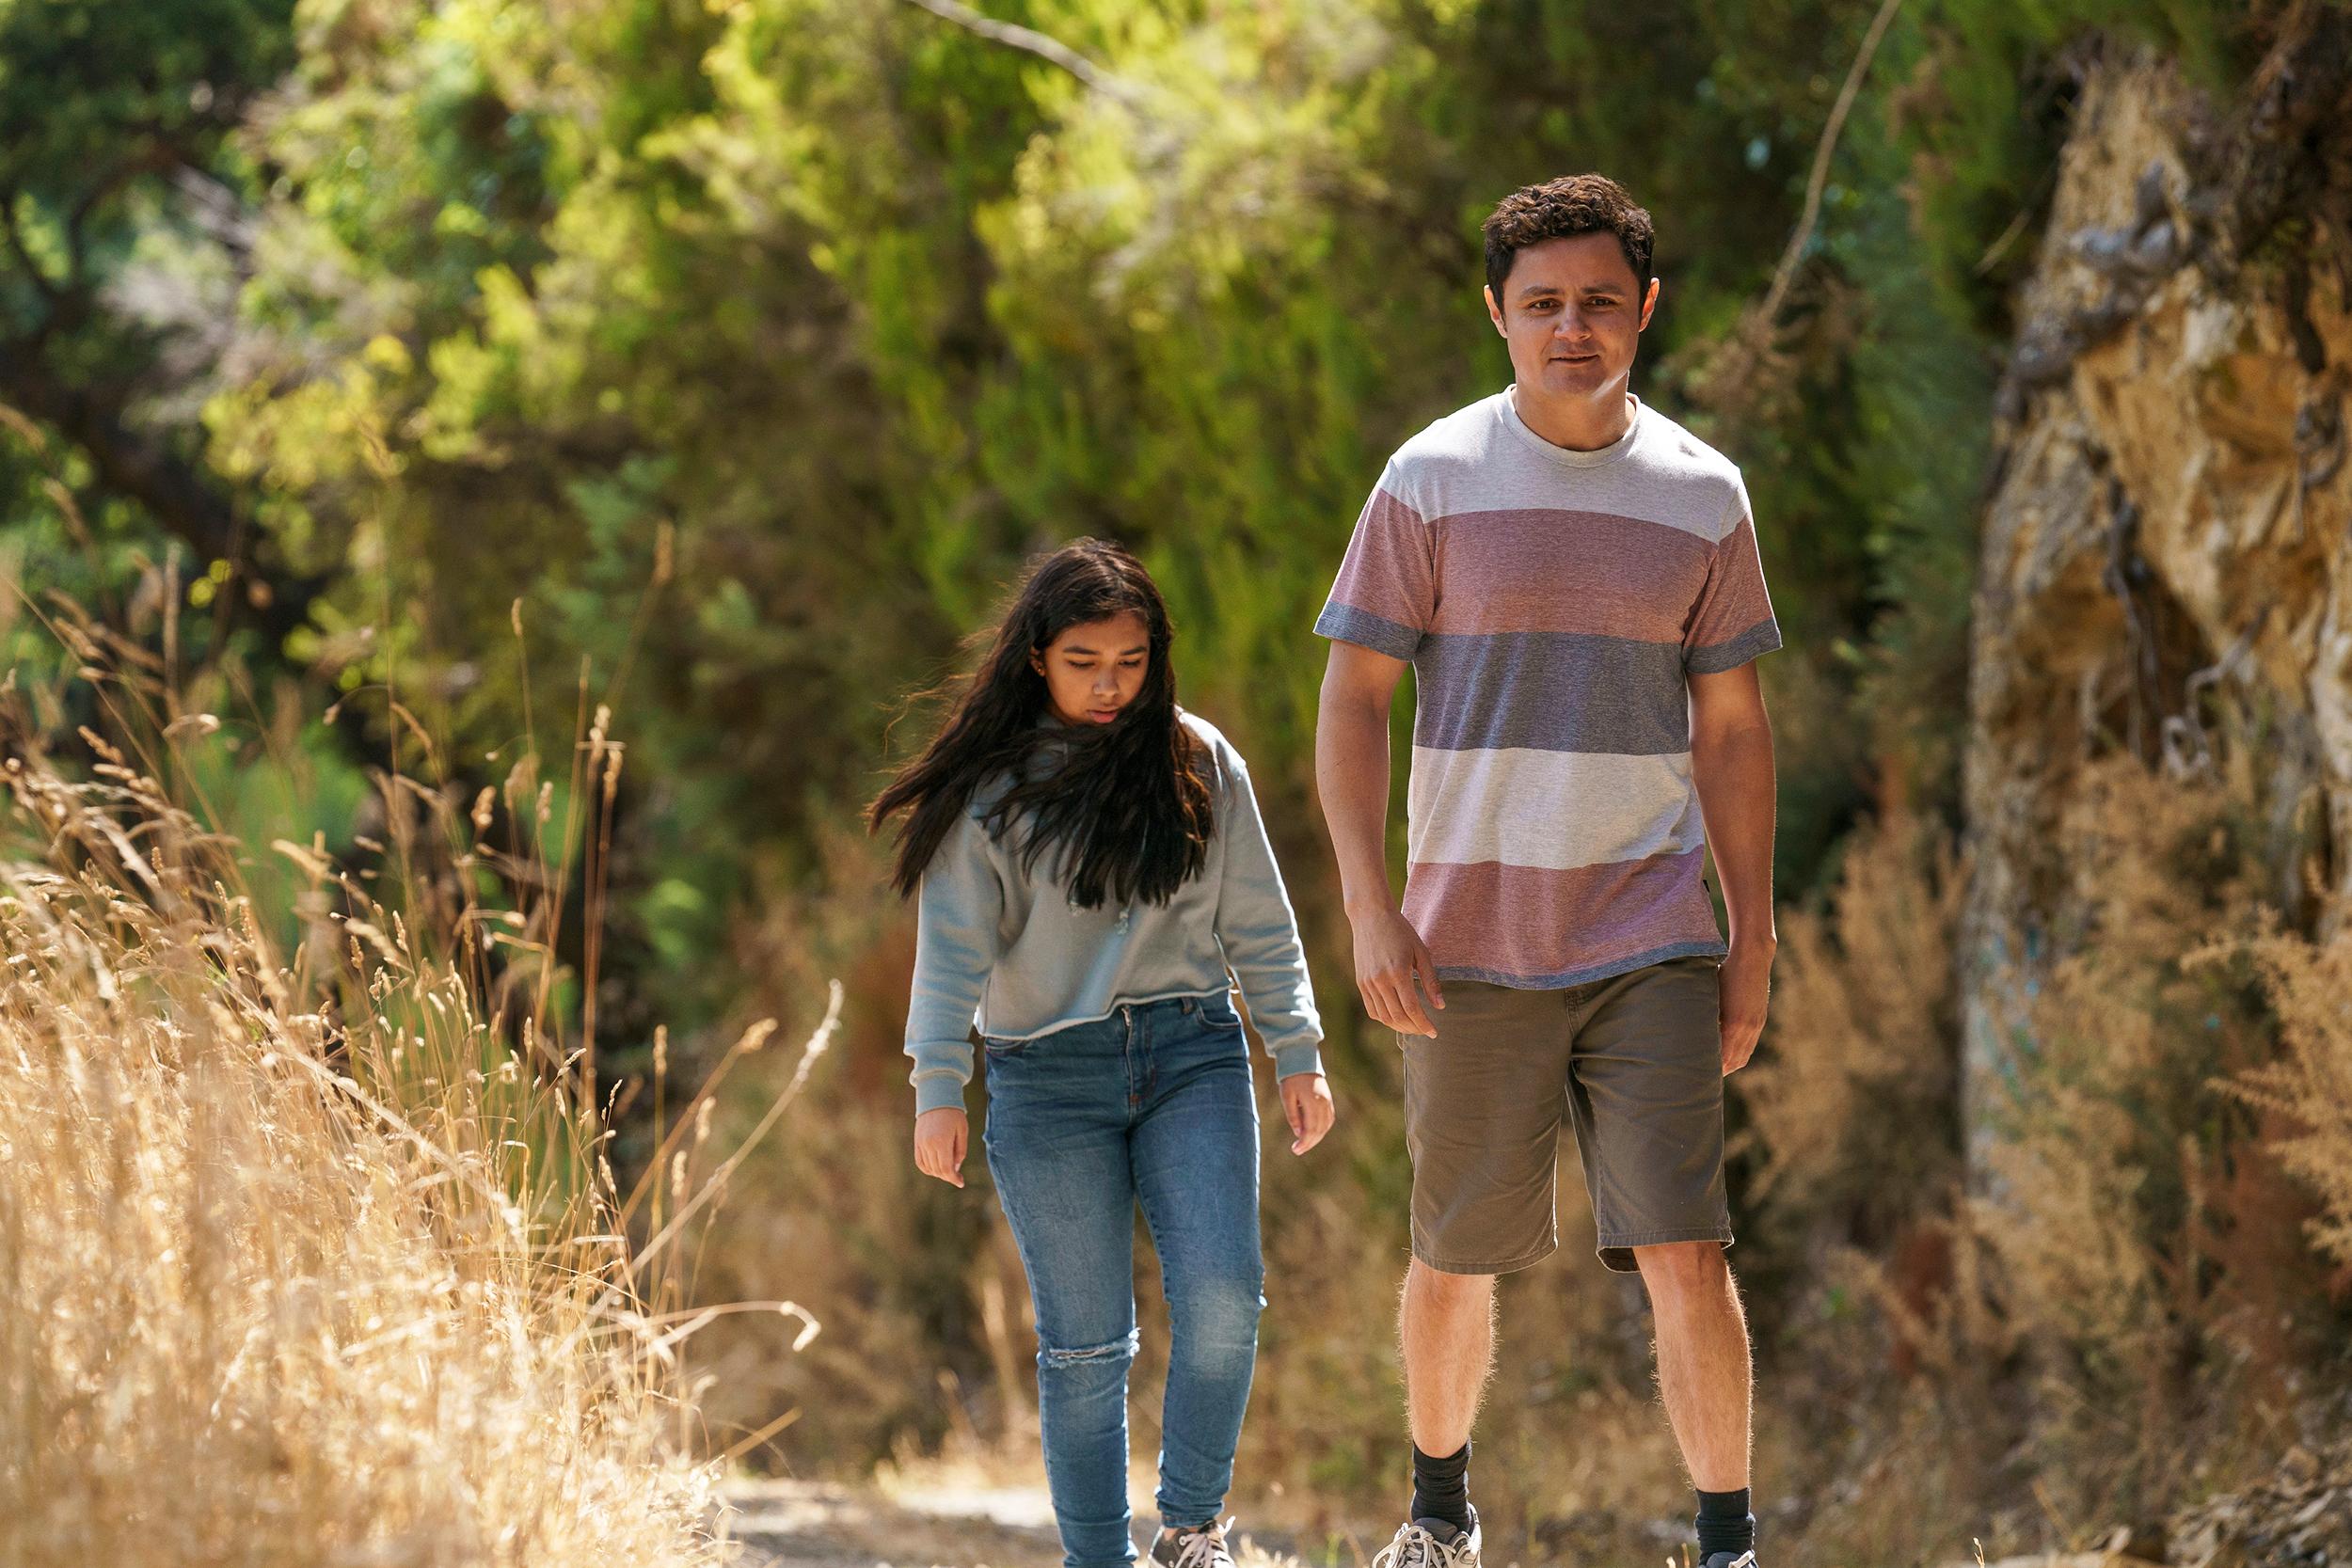 Arturo Castro's role in 'Mr. Corman' shows potential for Latino characters